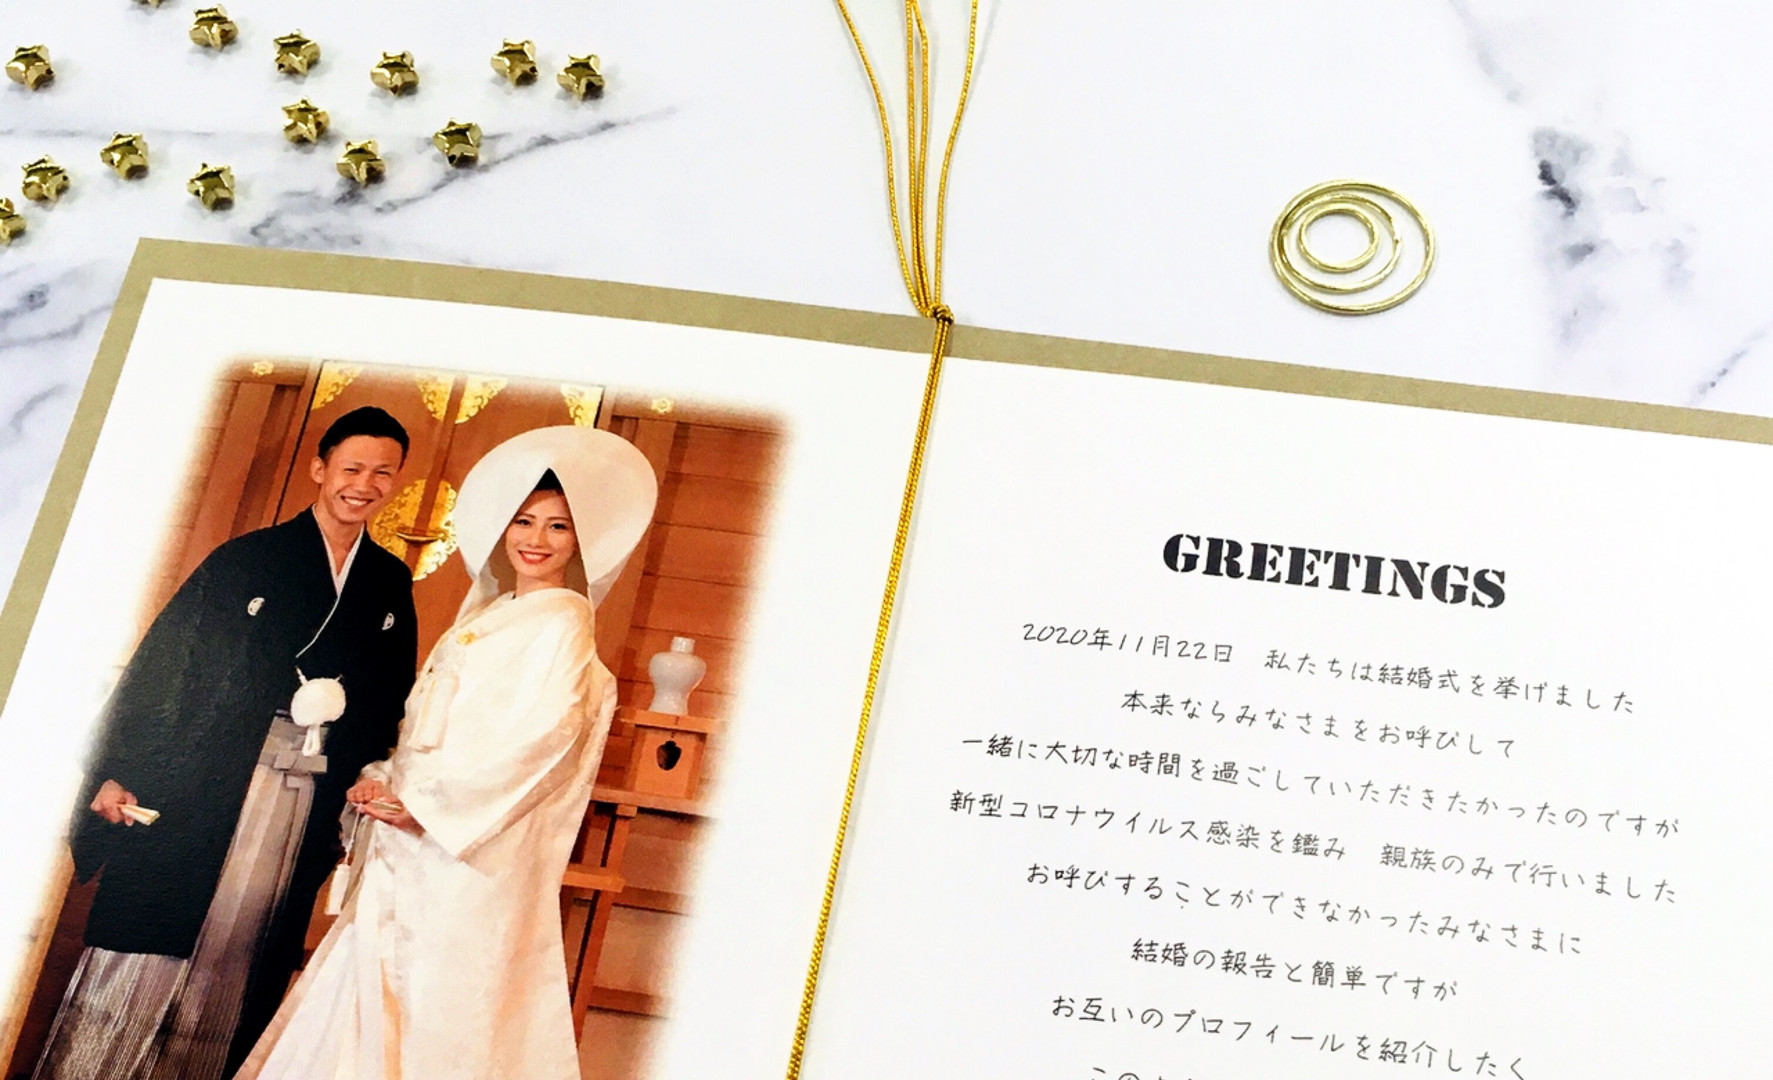 Just married デザイン2-B-4.jpg